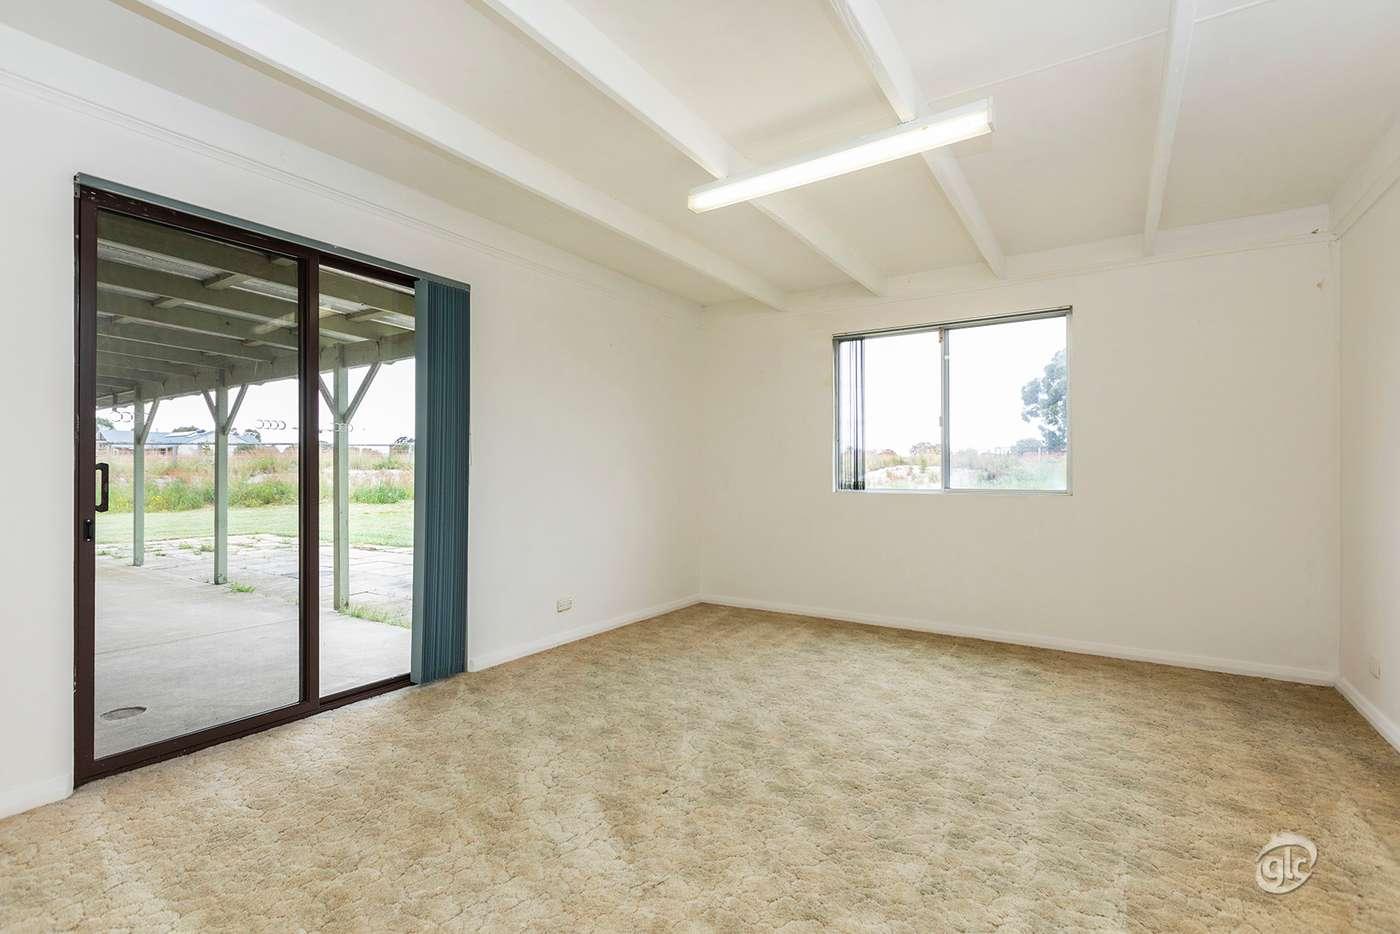 Sixth view of Homely house listing, 54 Coffey Road, Banjup WA 6164